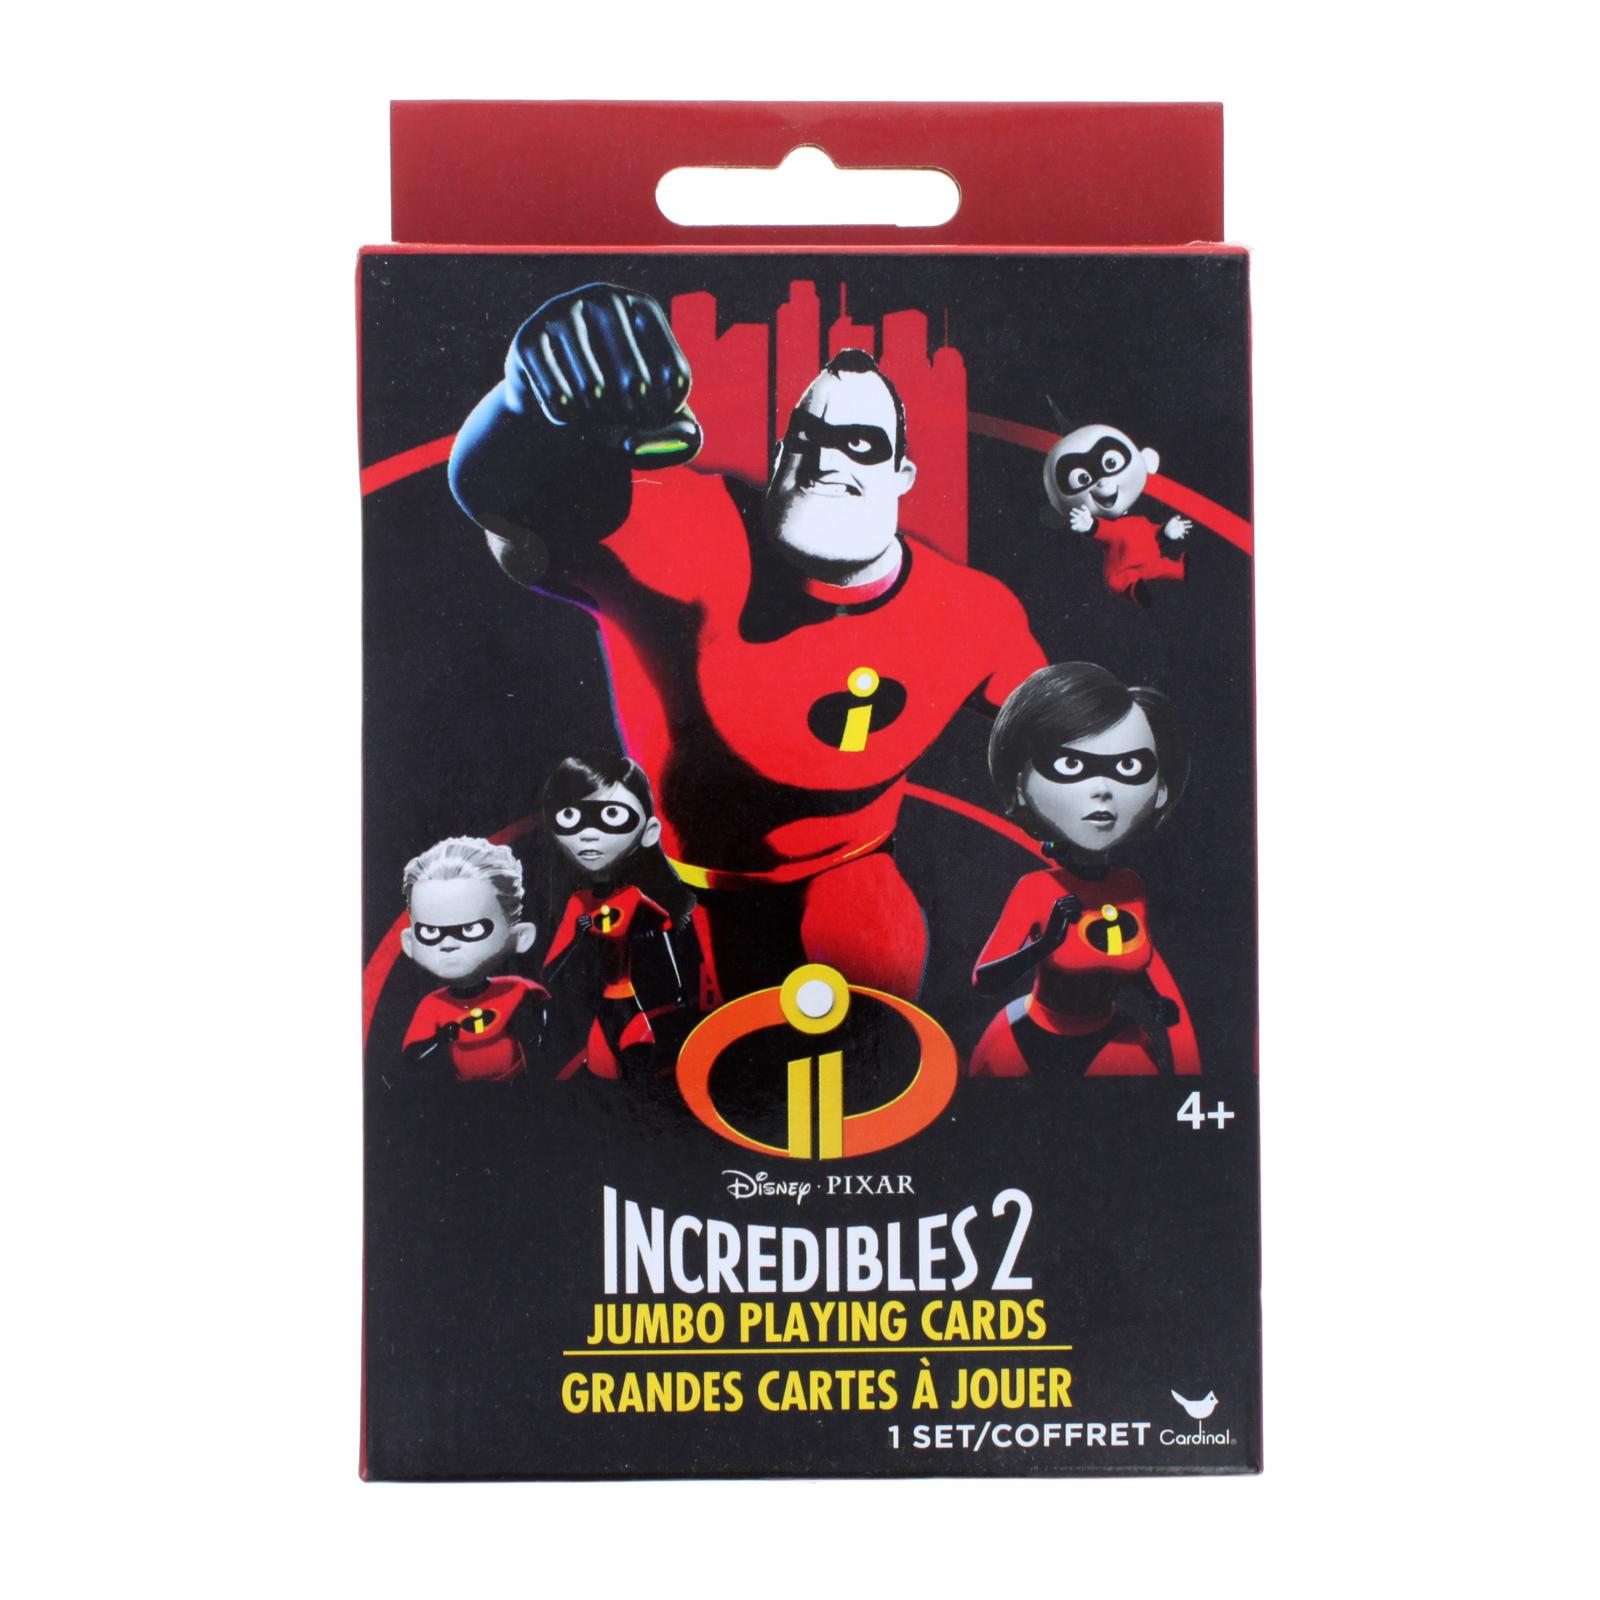 The Incredibles Kids Jumbo Playing Card Deck